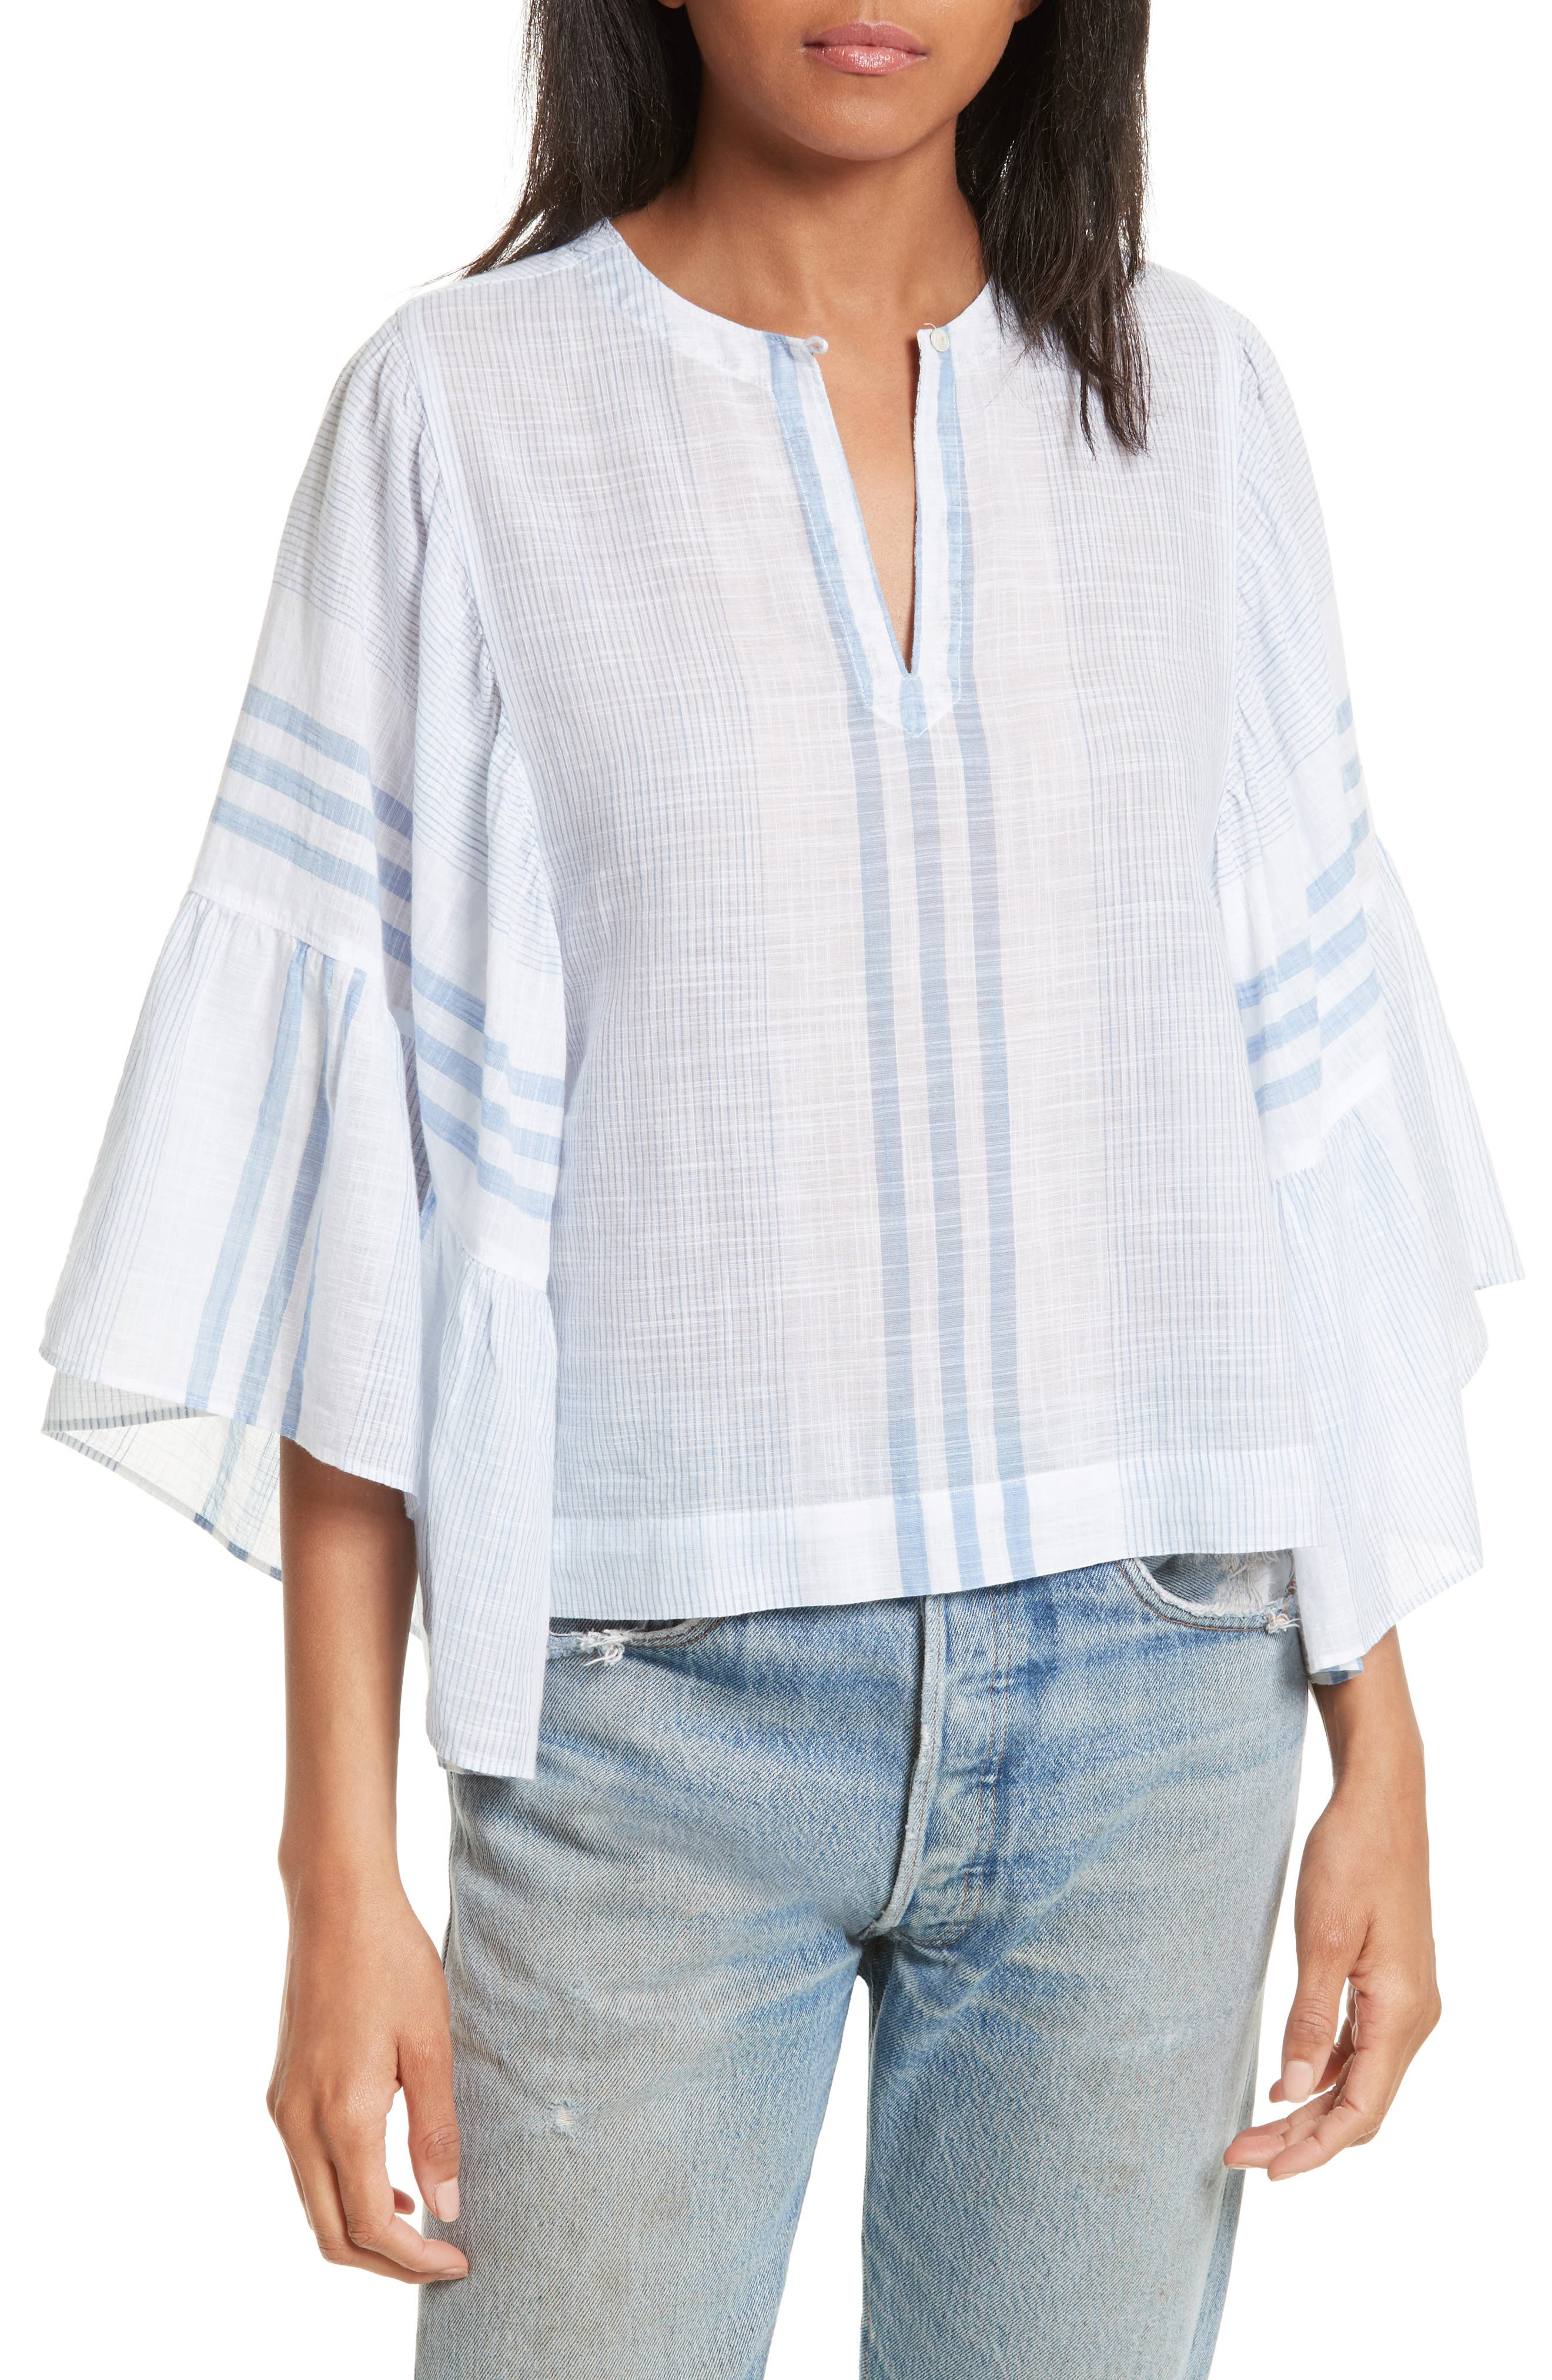 La Vie Rebecca Taylor Bell Sleeve Stripe Top